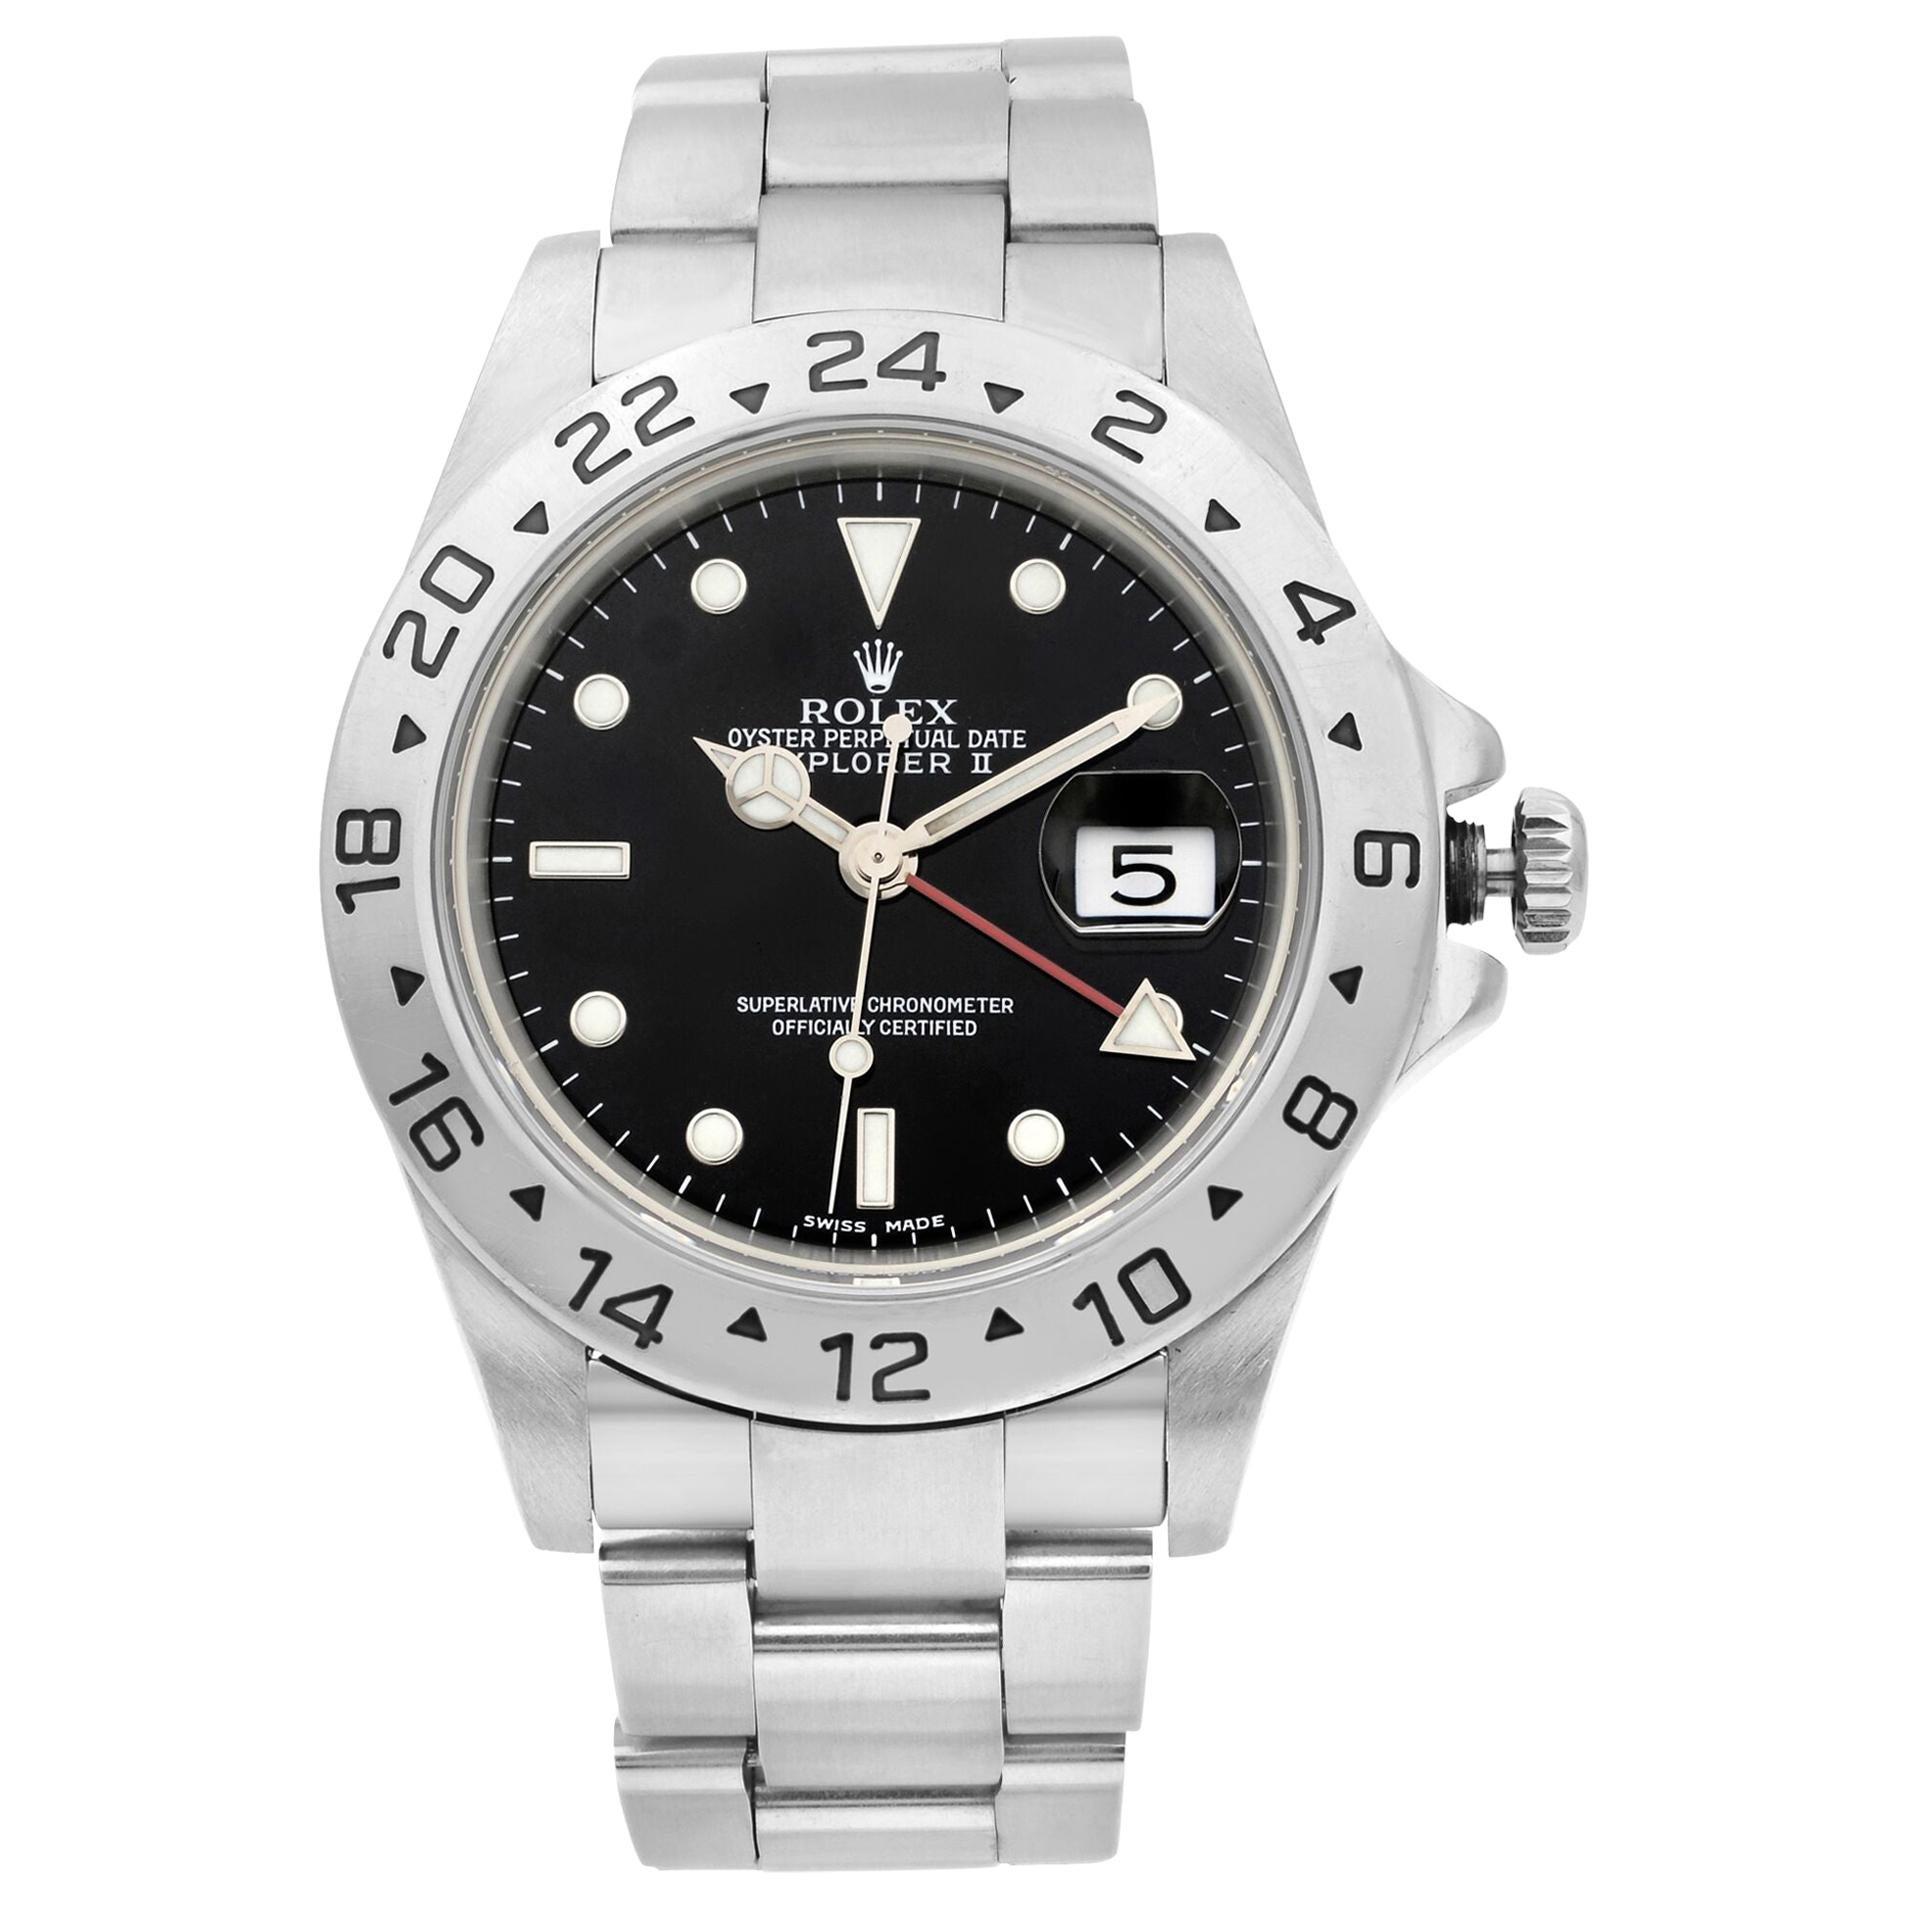 Rolex Explorer II Stainless Steel Black Dial Automatic Men's Watch 16570